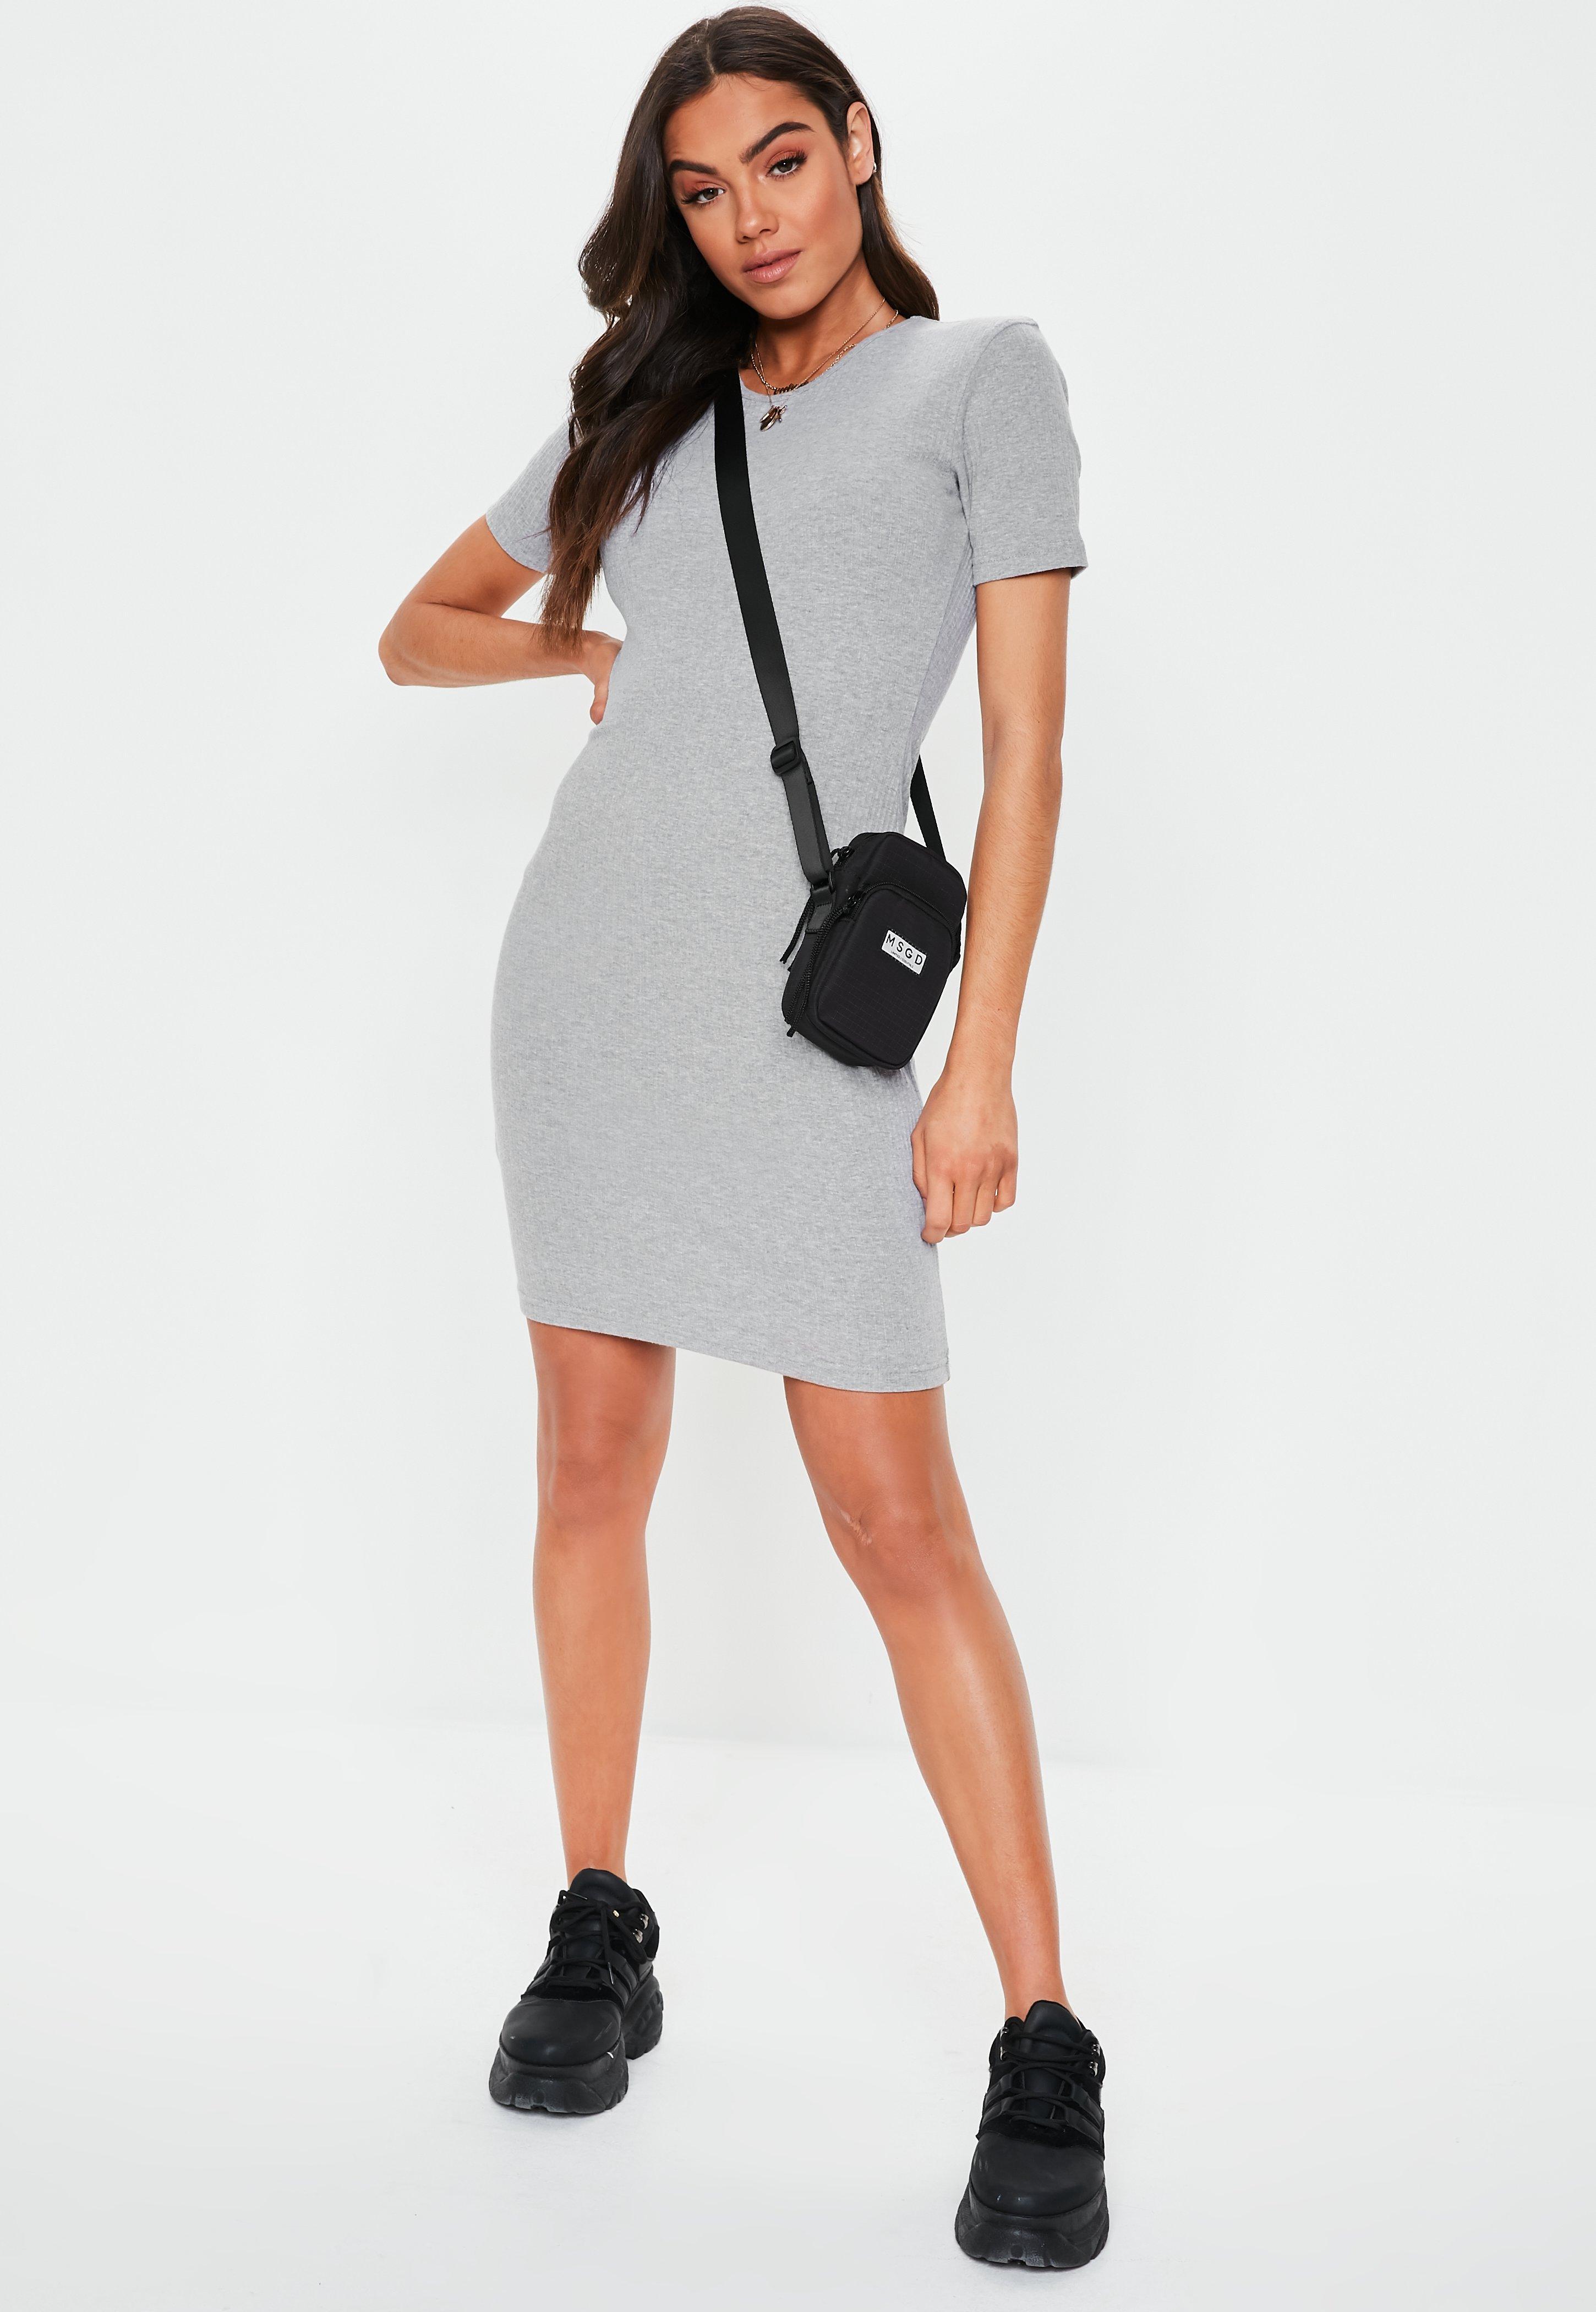 7c4884cb14 Missguided Tall Bridesmaid Gray Scallop Trim Maxi Dress